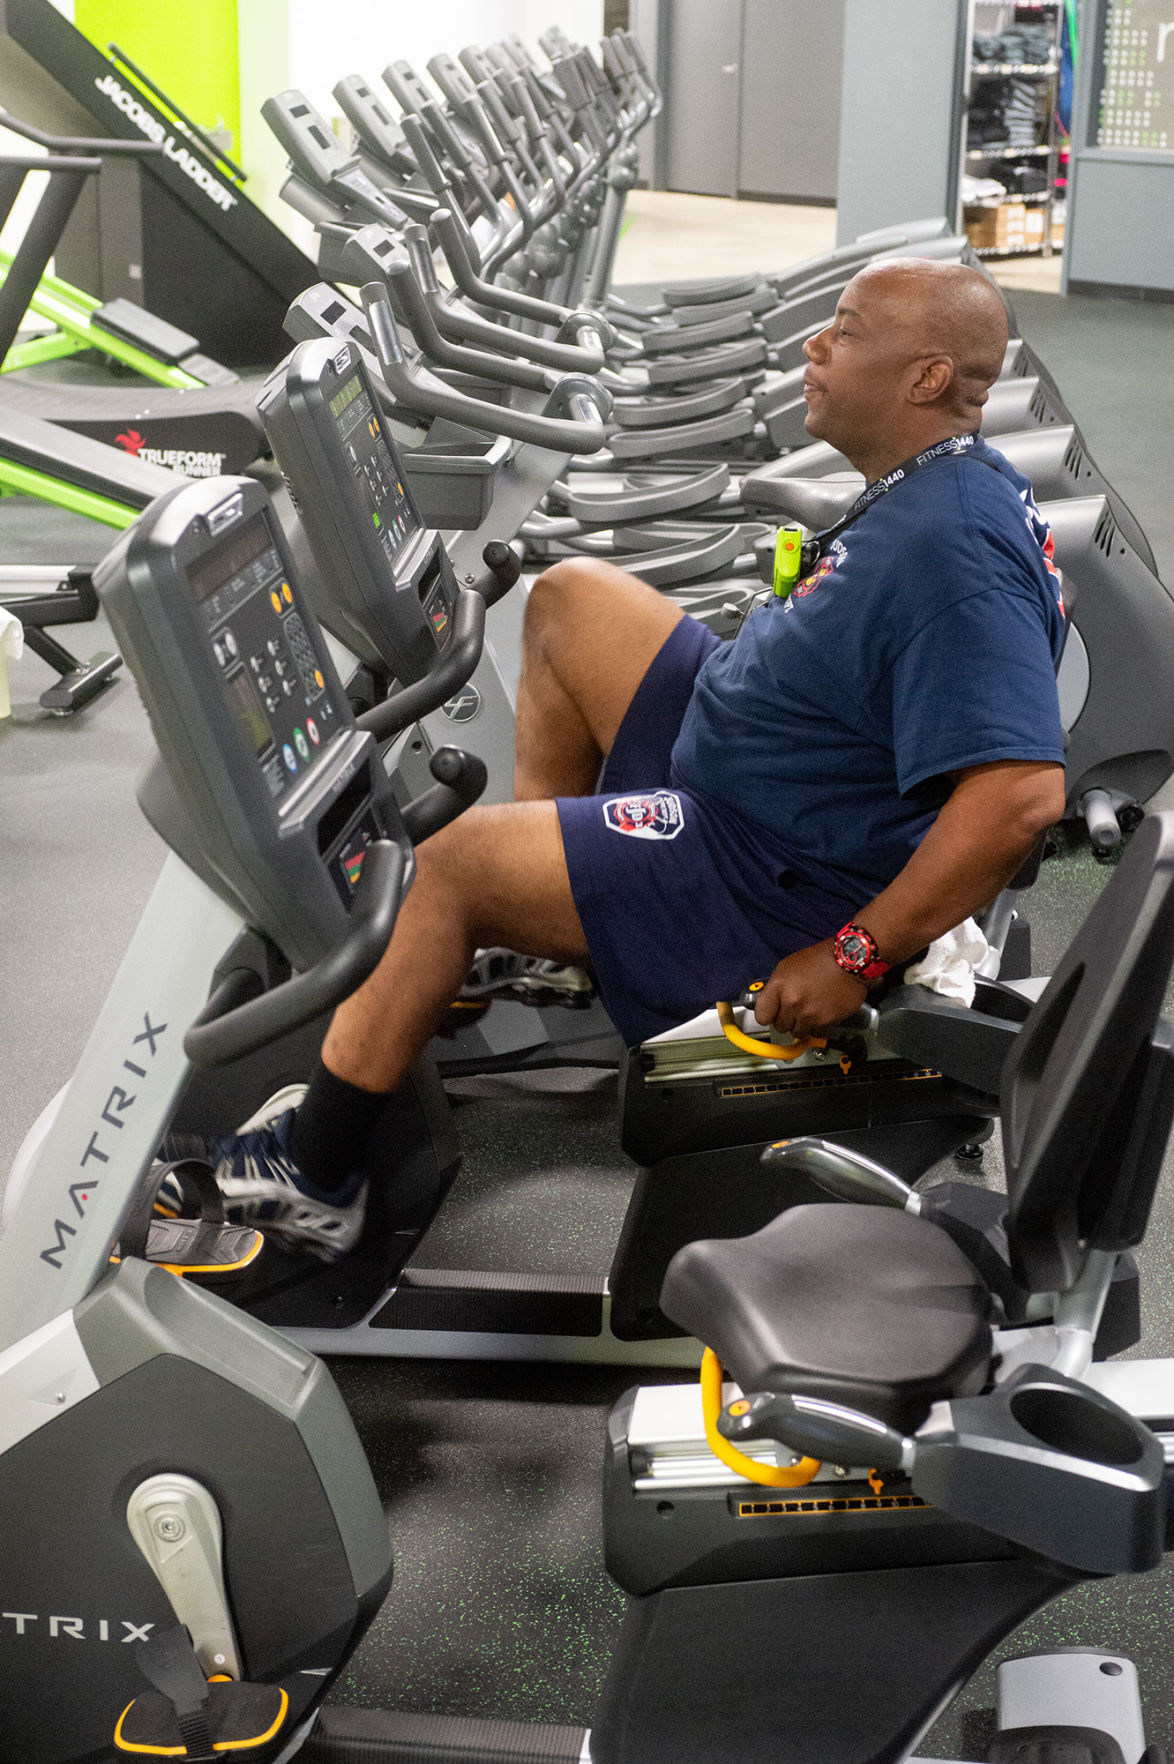 La Fitness Panola : fitness, panola, Longview, Reopen, Capacity,, Obeying, Sanitation, Requirements, Coronavirus, News-journal.com